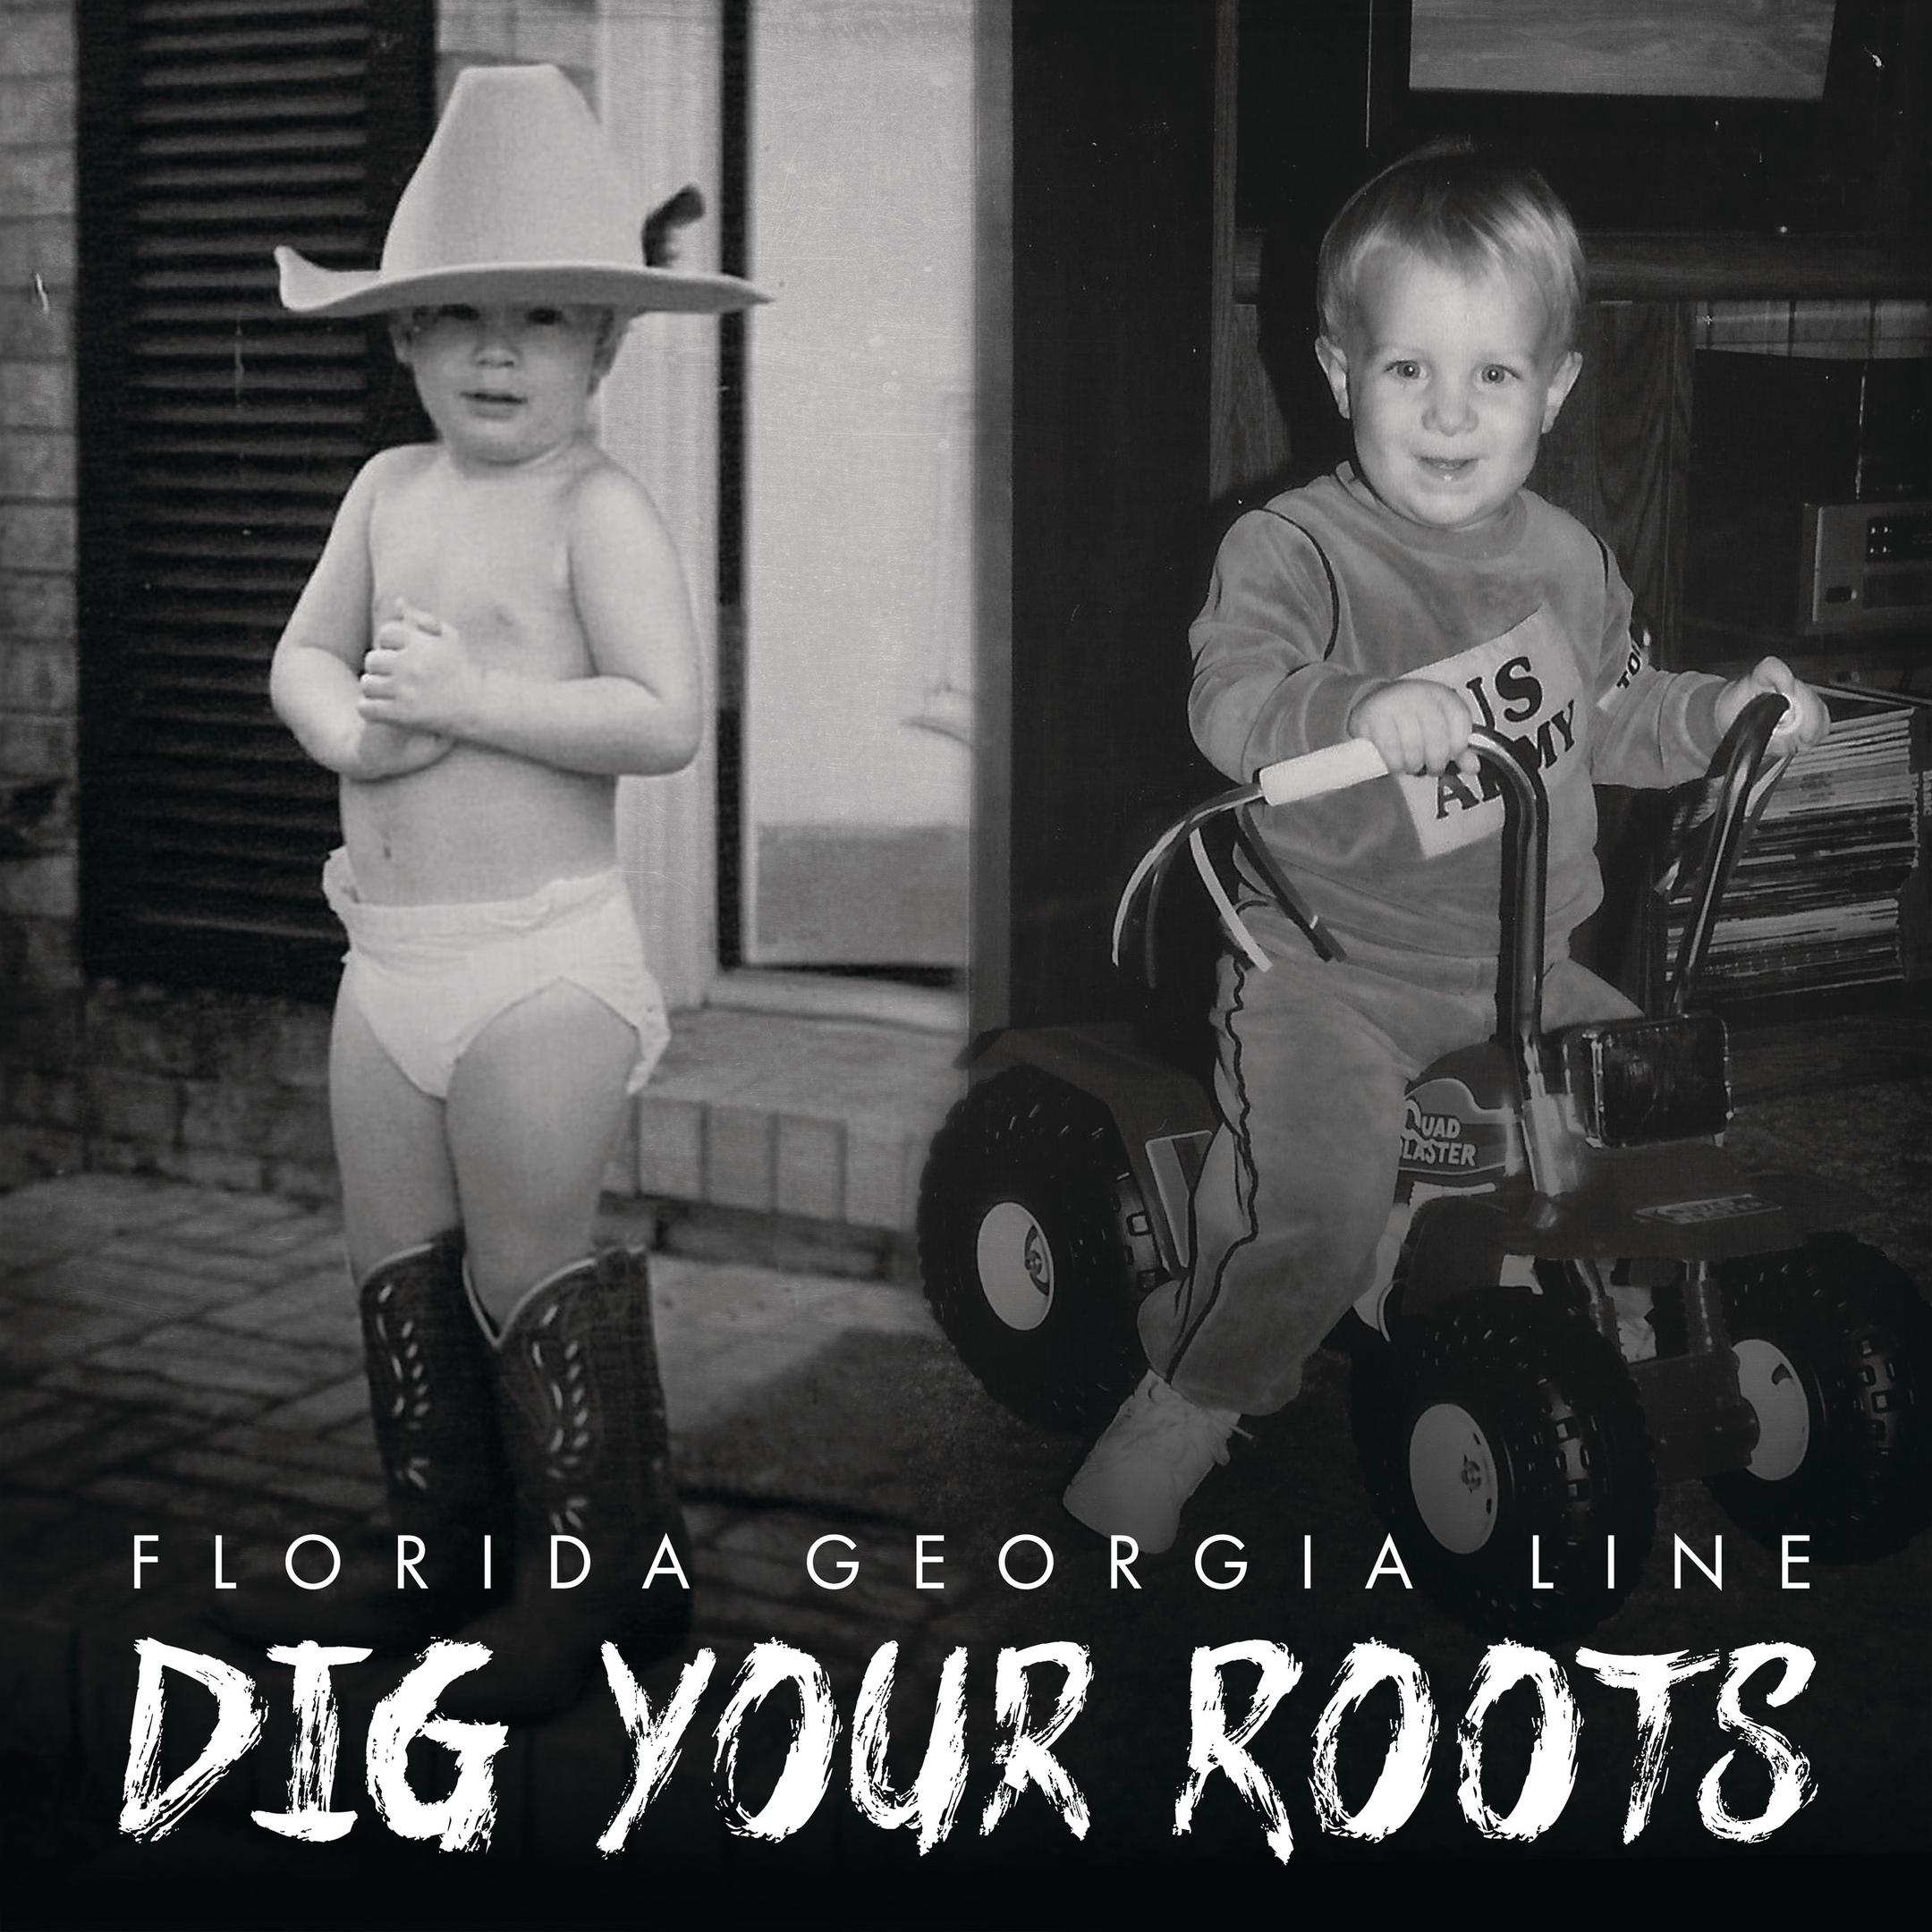 Florida Georgia Line album Dig Your Roots